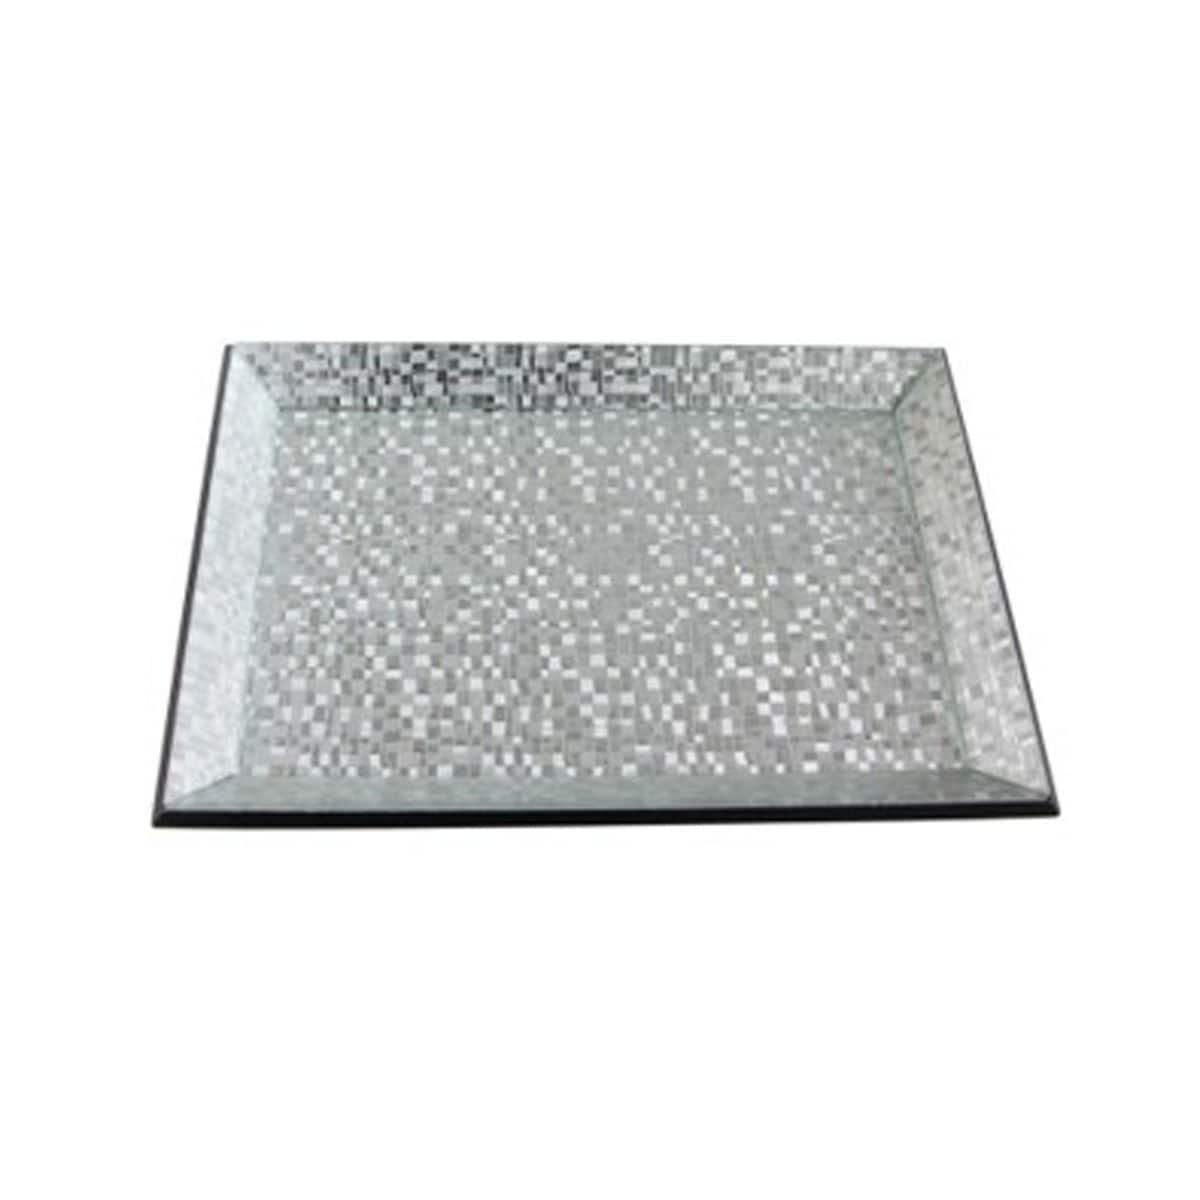 Charola Diseño Plata Espejo 15X10 Precious Home